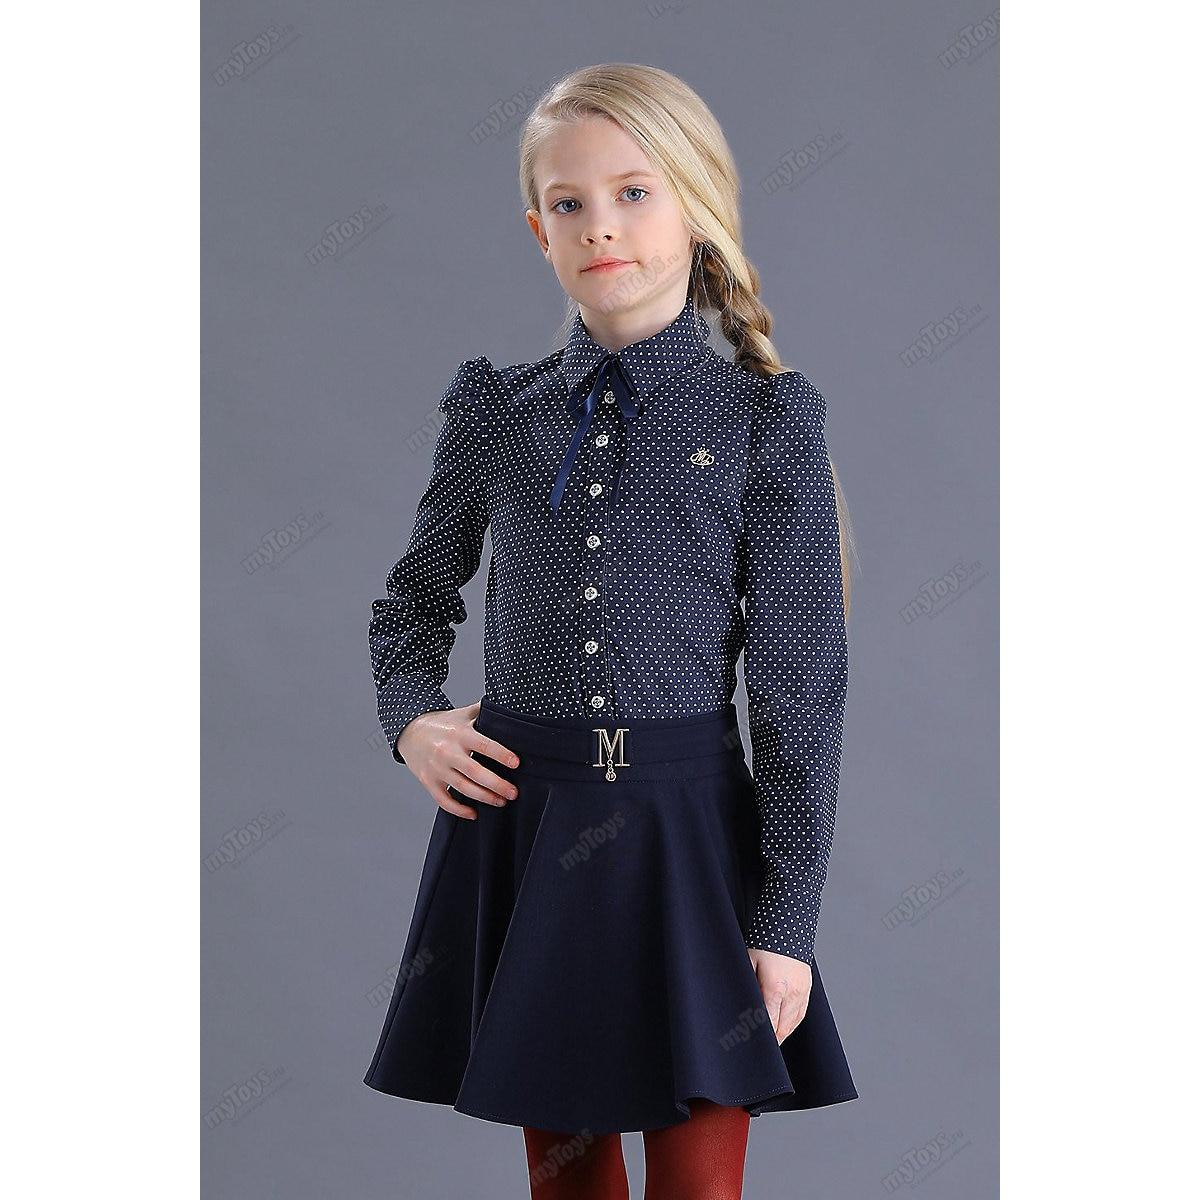 Malenkaya Lady Blouses & Shirts 11685553 blouse for girl school  clothes jacket wardrobe childrens shirt White Blue Girls Turn-down Collar